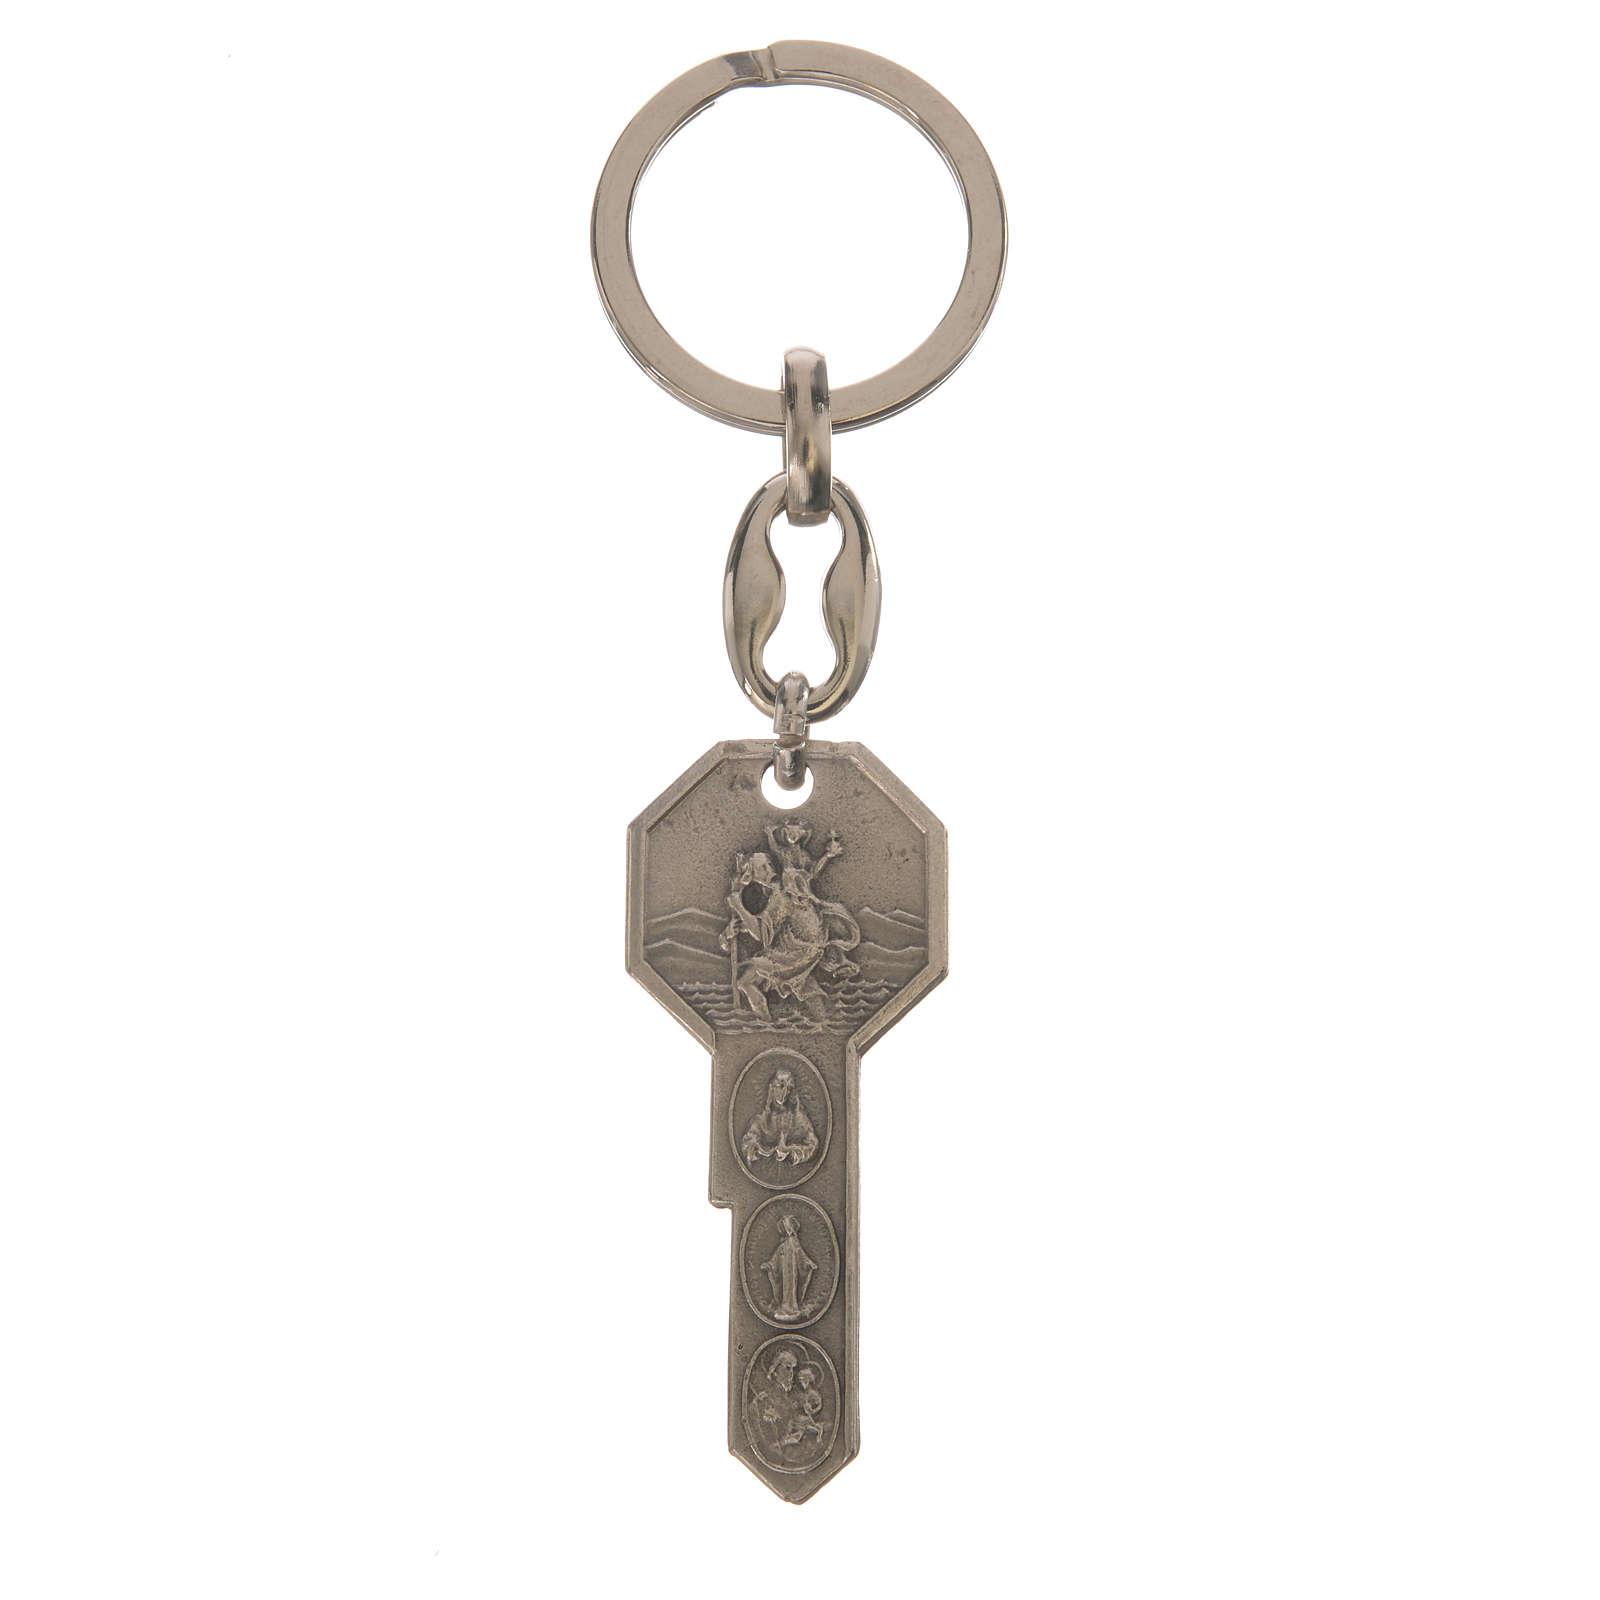 Key Chain key shaped 3